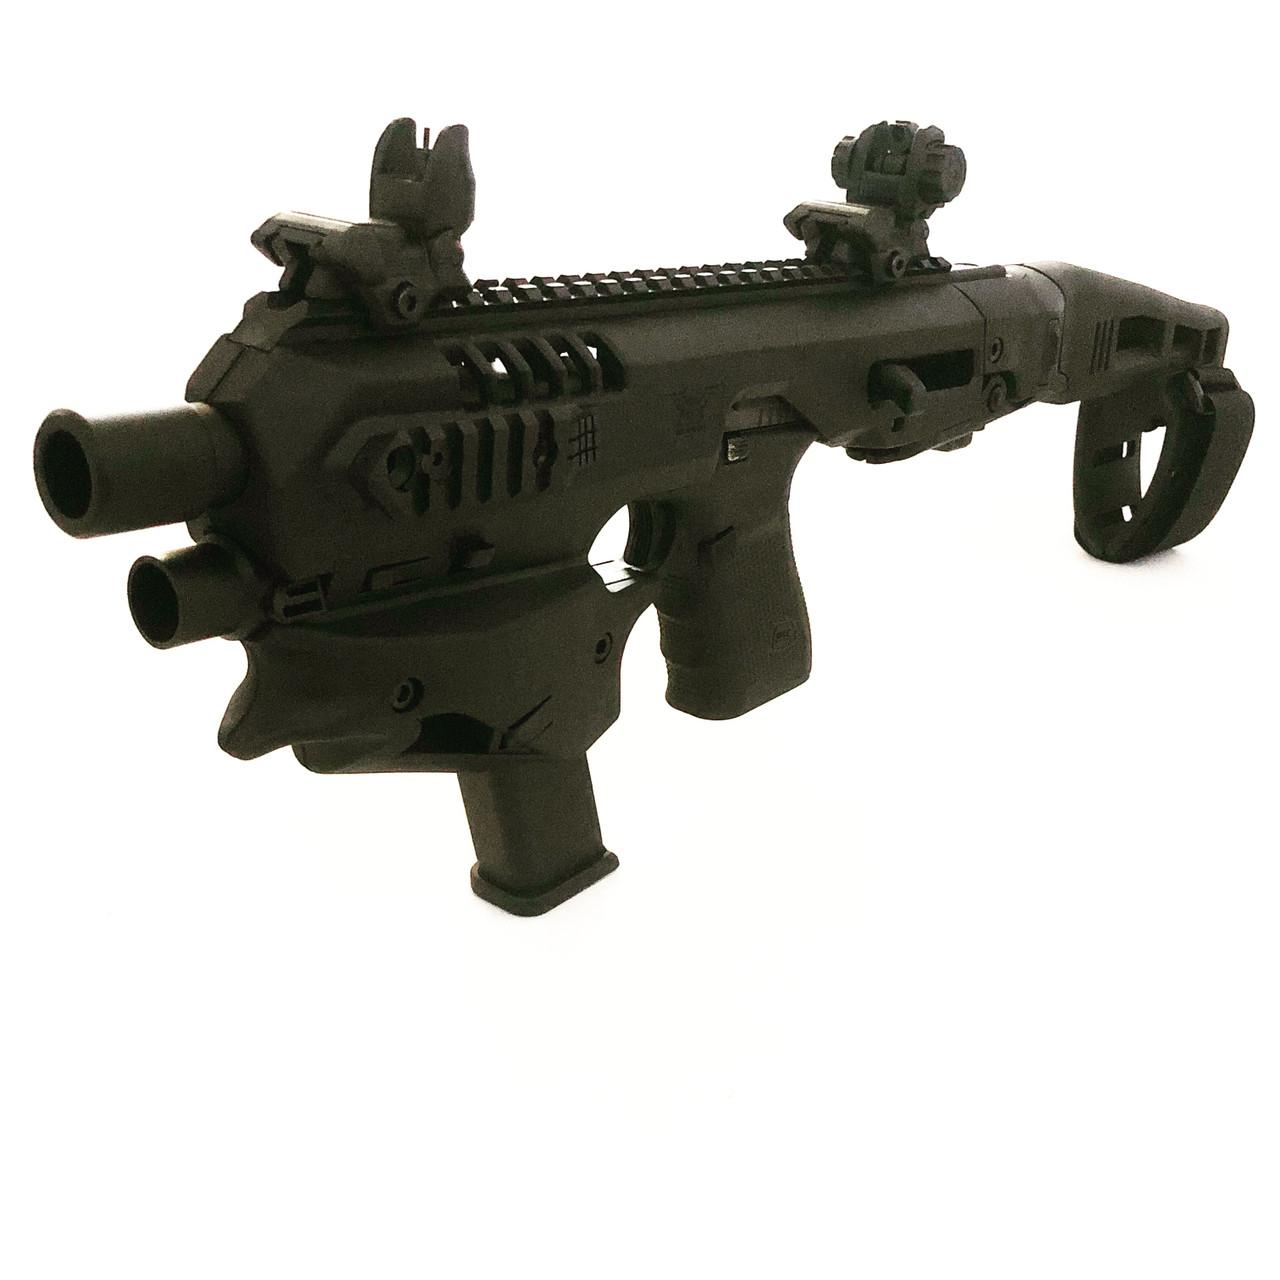 MCK Micro Conversion Kit BUS Combo ( Glock 17/19/19X/22/23/31/32/45)